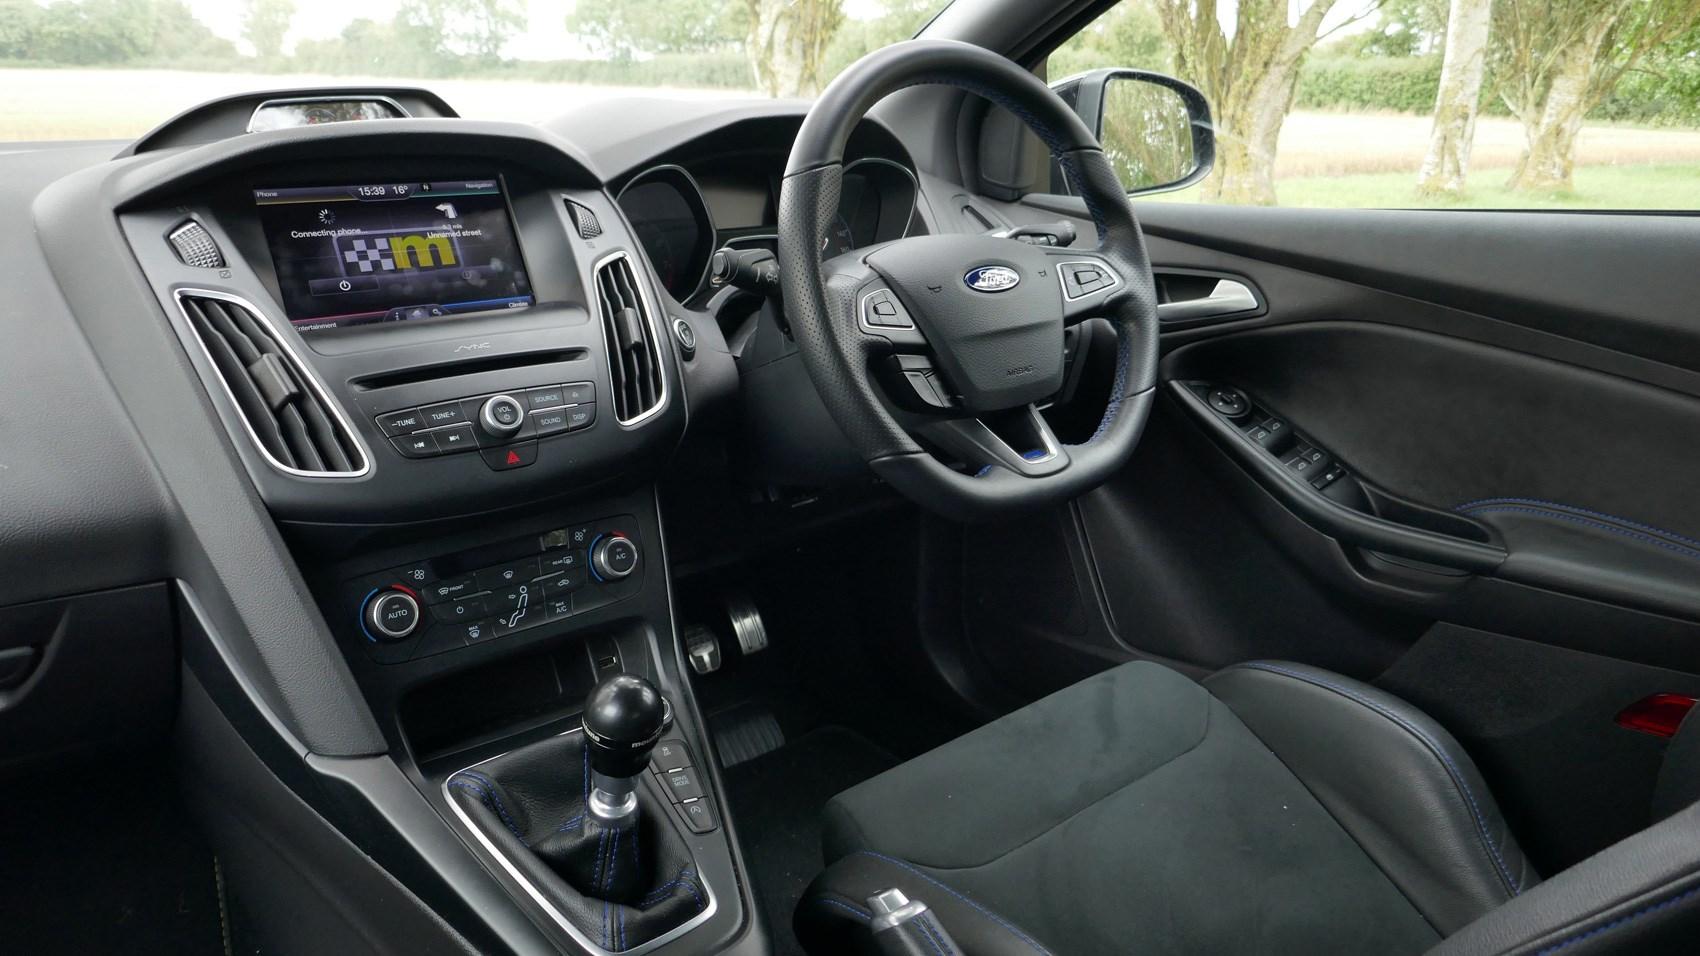 Ford Focus RS M400 Mountune interior